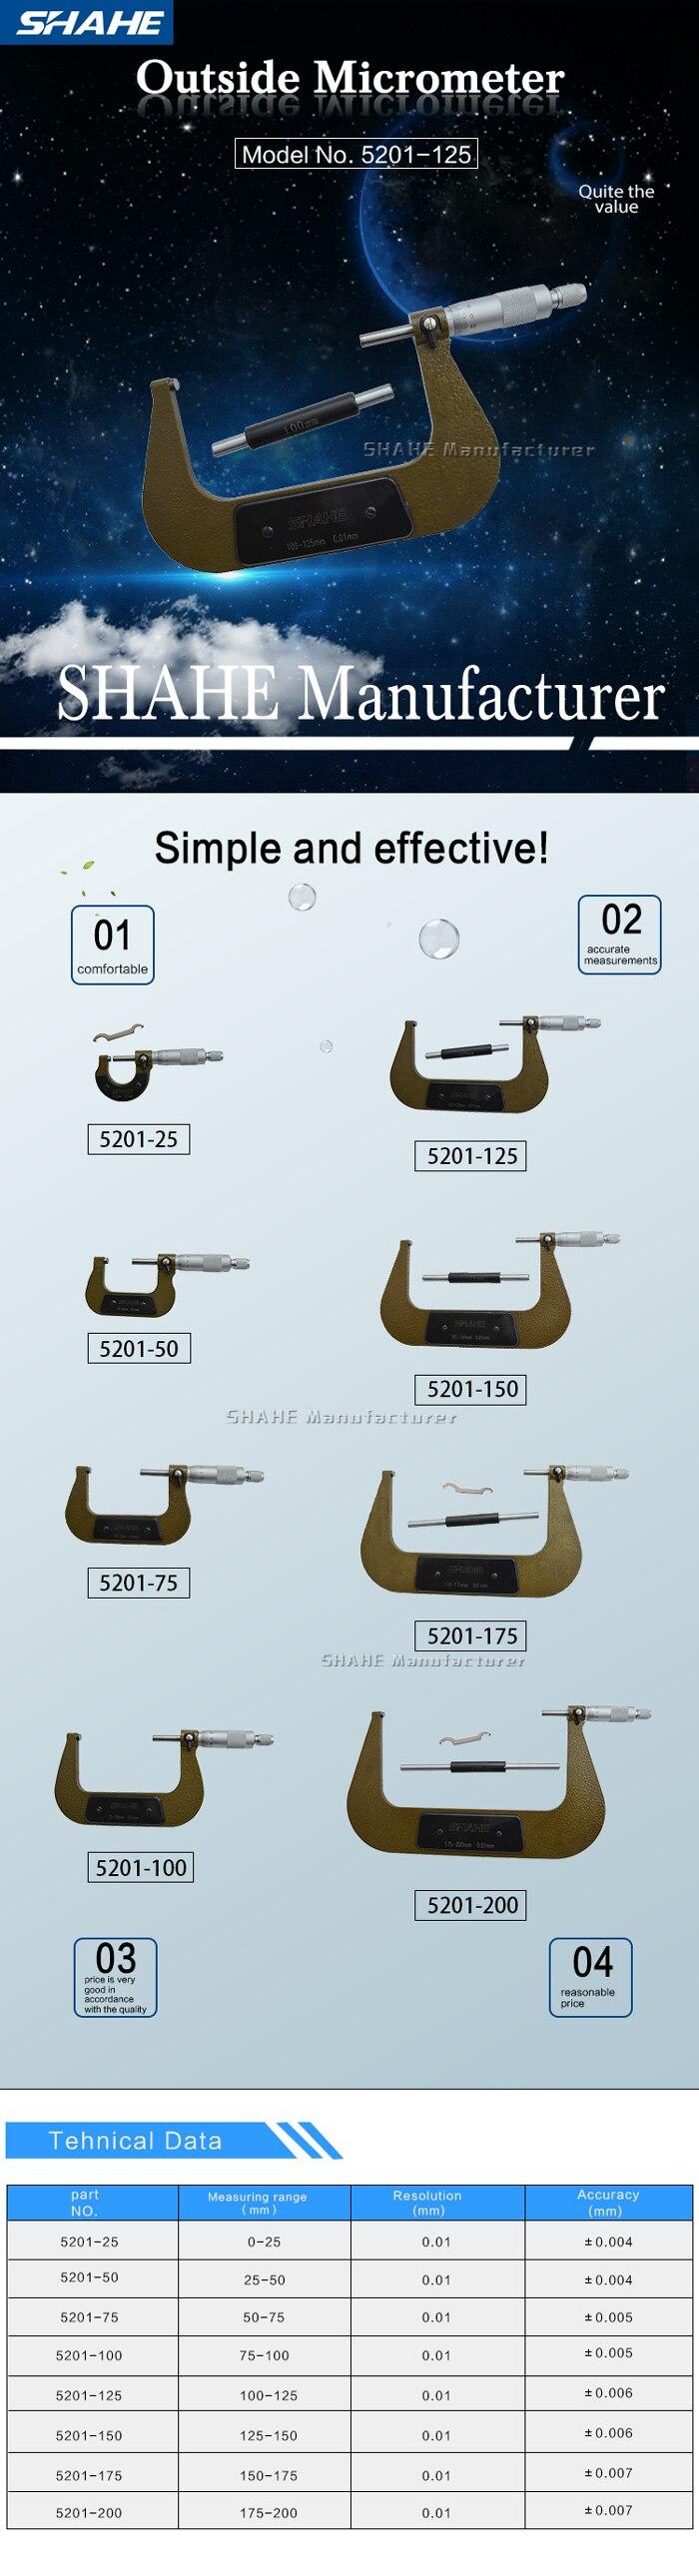 SHAHE 100-125mm 0.01mm Outside Micrometer Micrometro Gauge Hardened Alloy